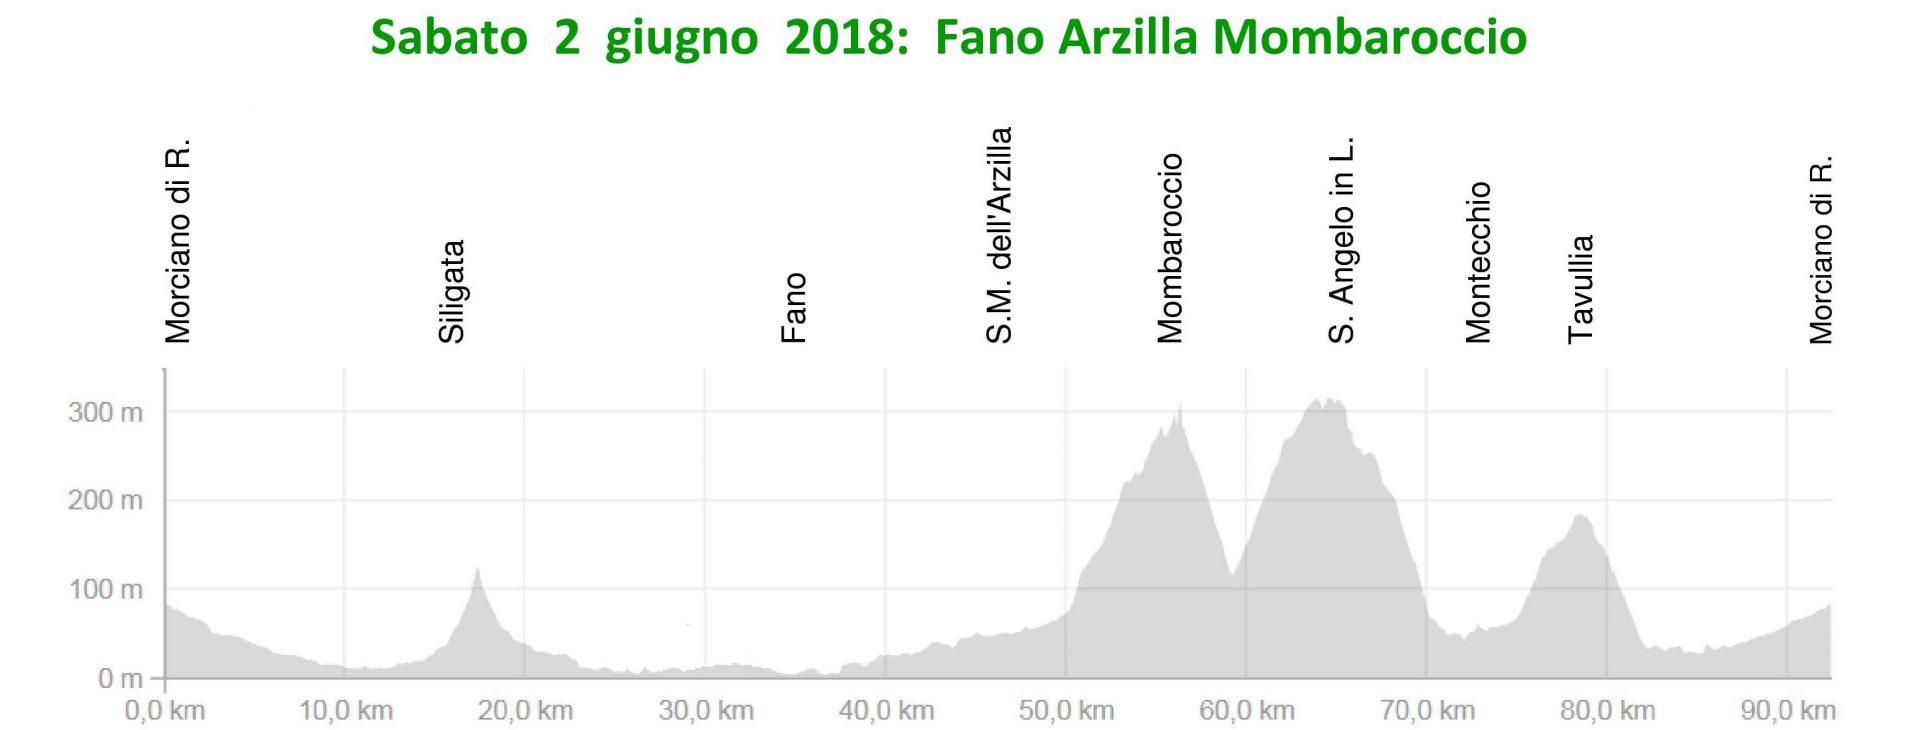 Sabato 2-giu-2018 Fano-Arzilla-Monbaroccio